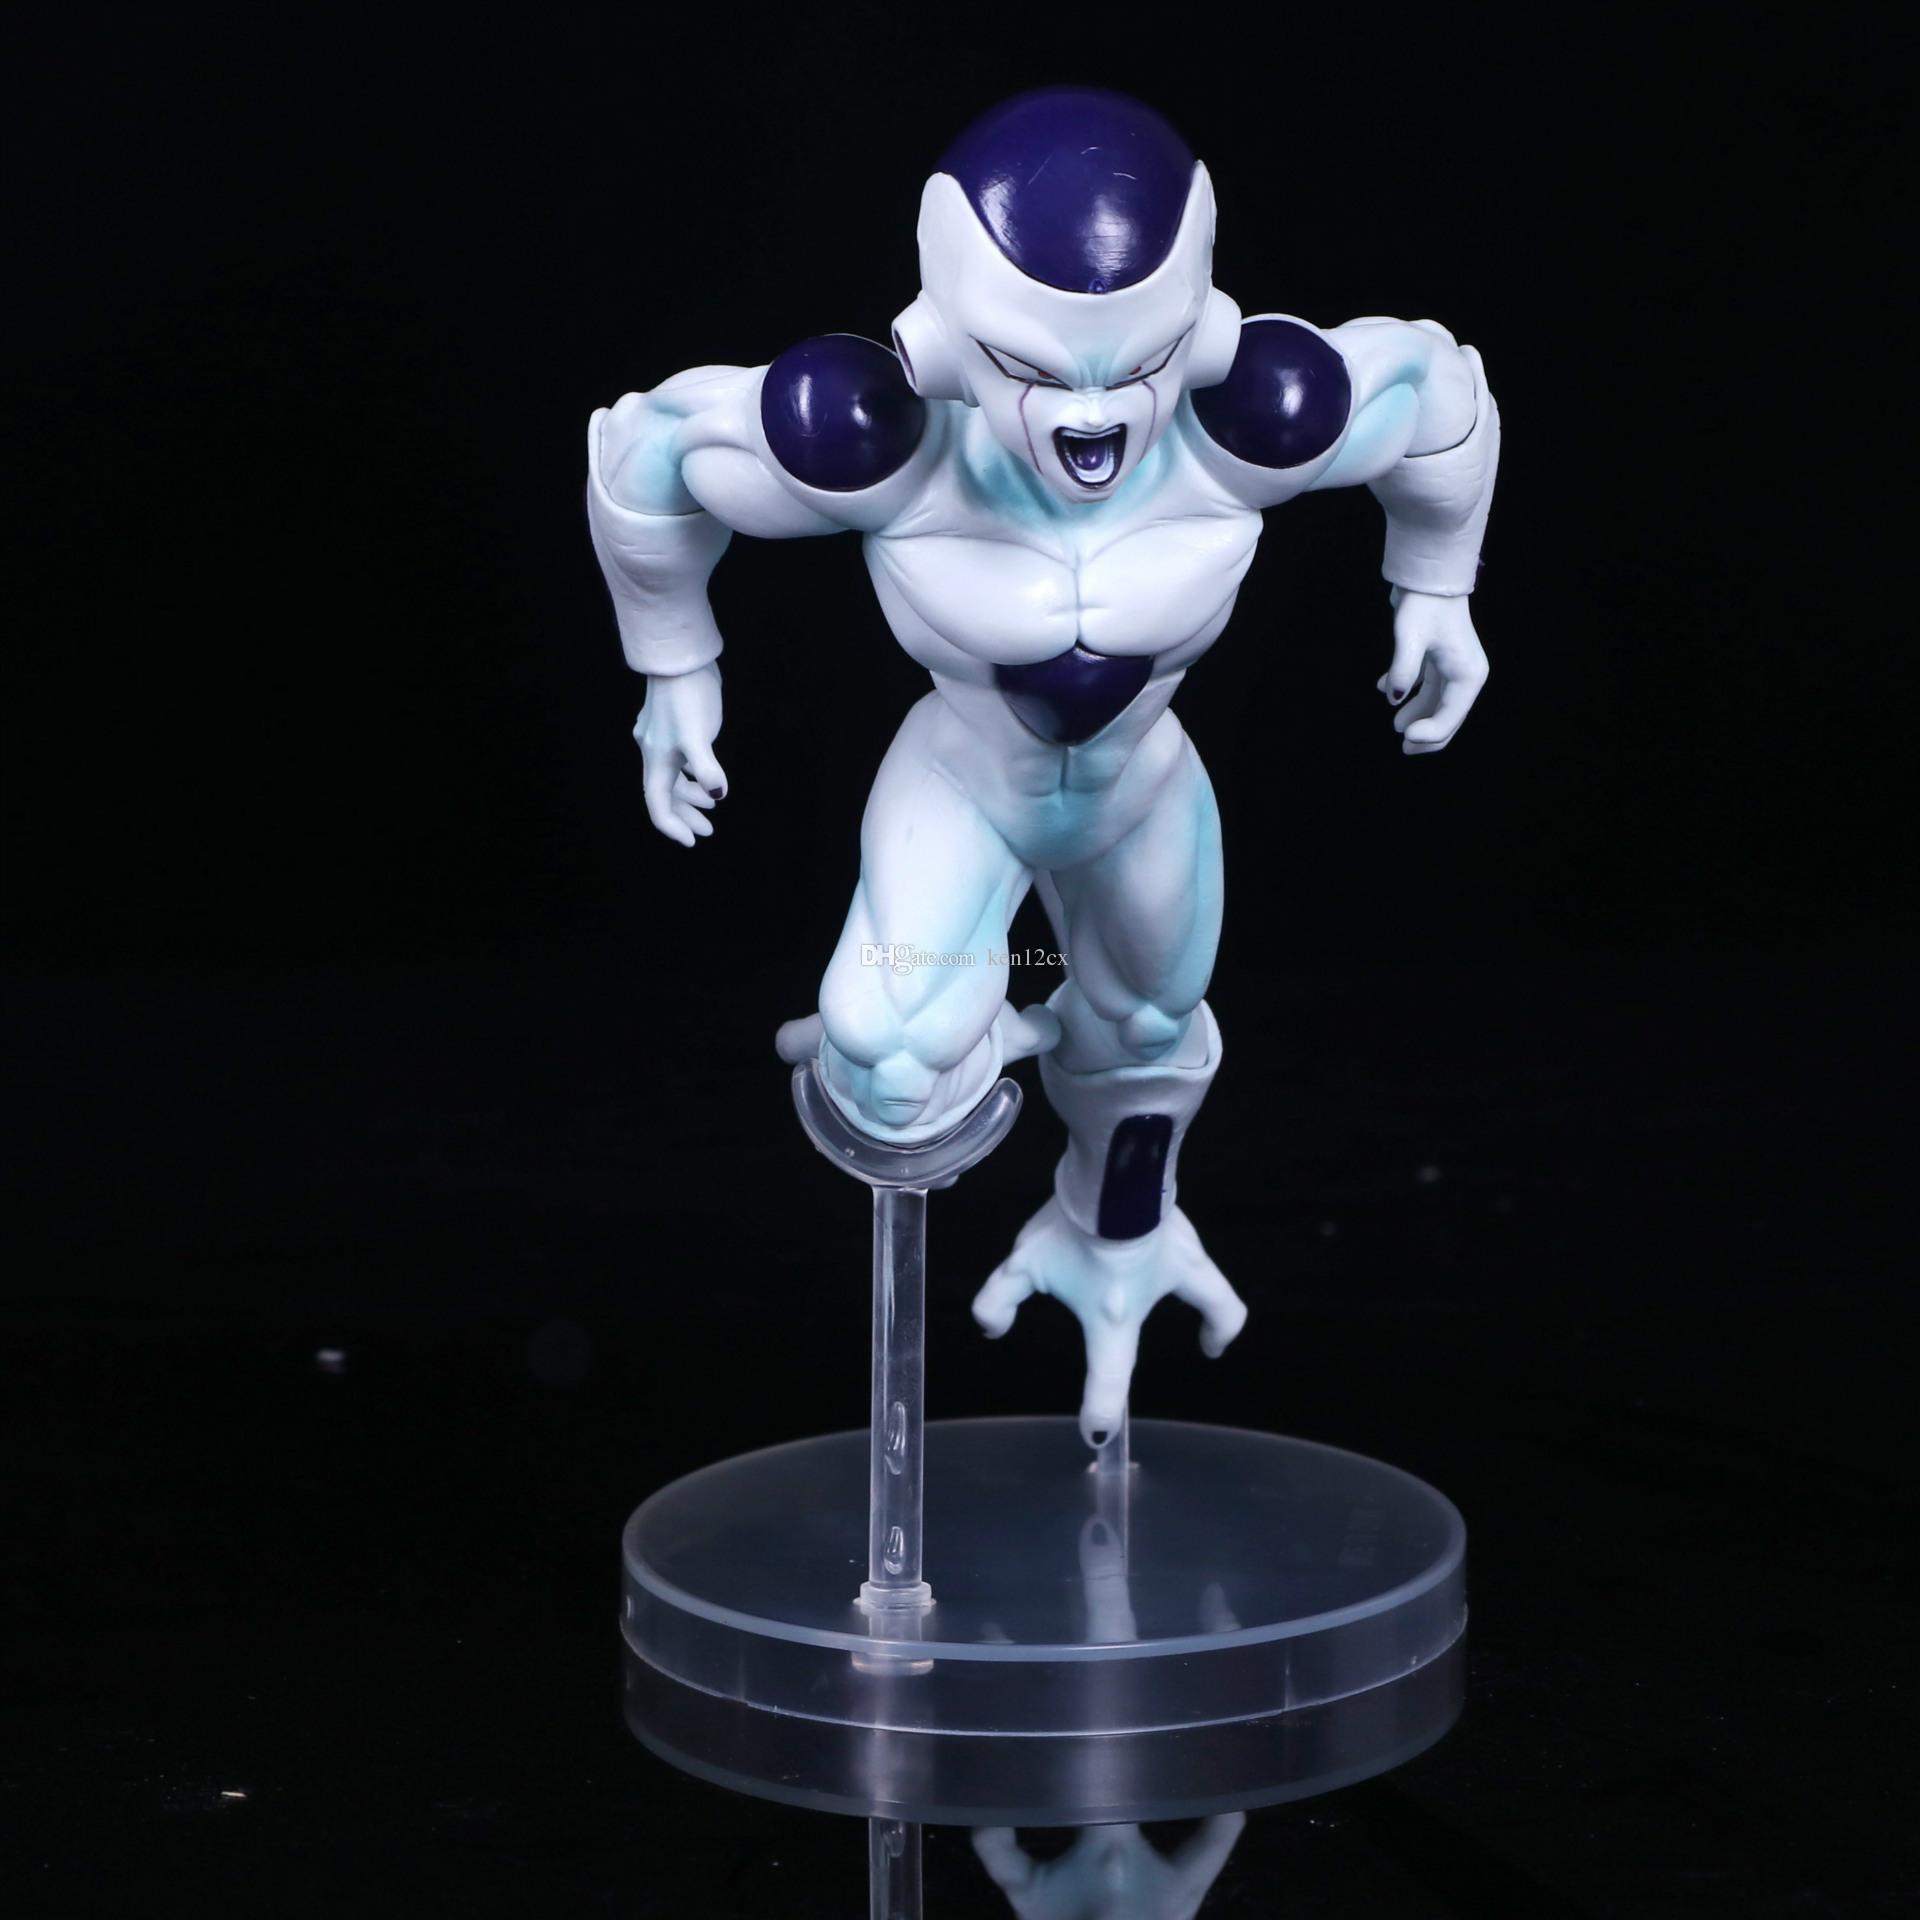 Freezer Figure 7/'/' PVC Model Toy Gift // Frieza DragonBall Z Freeza That Hurt